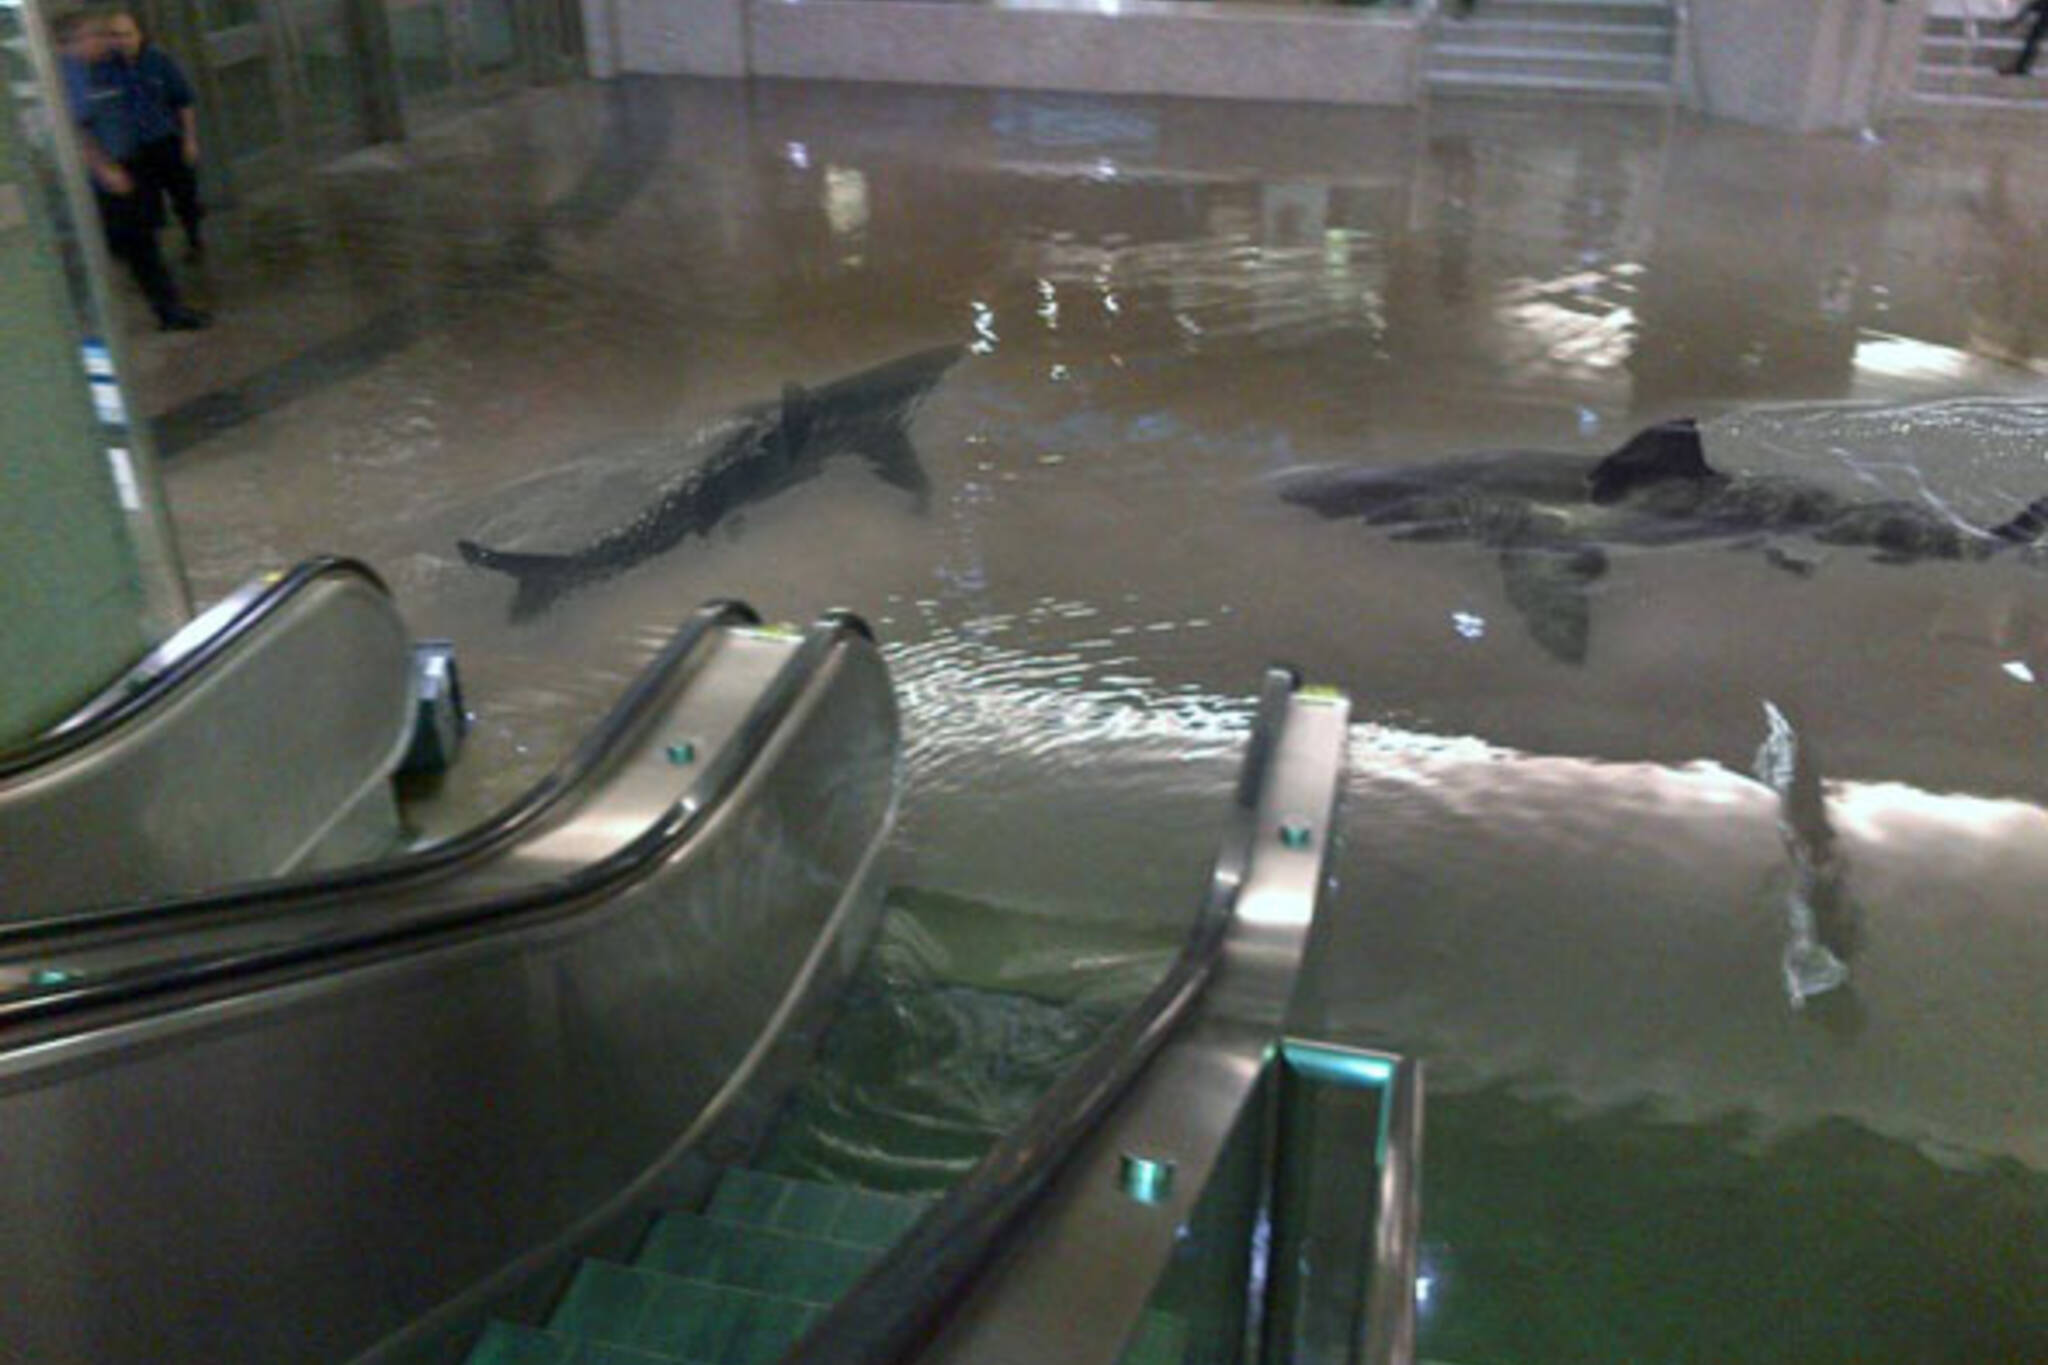 Union Station flood sharks meme